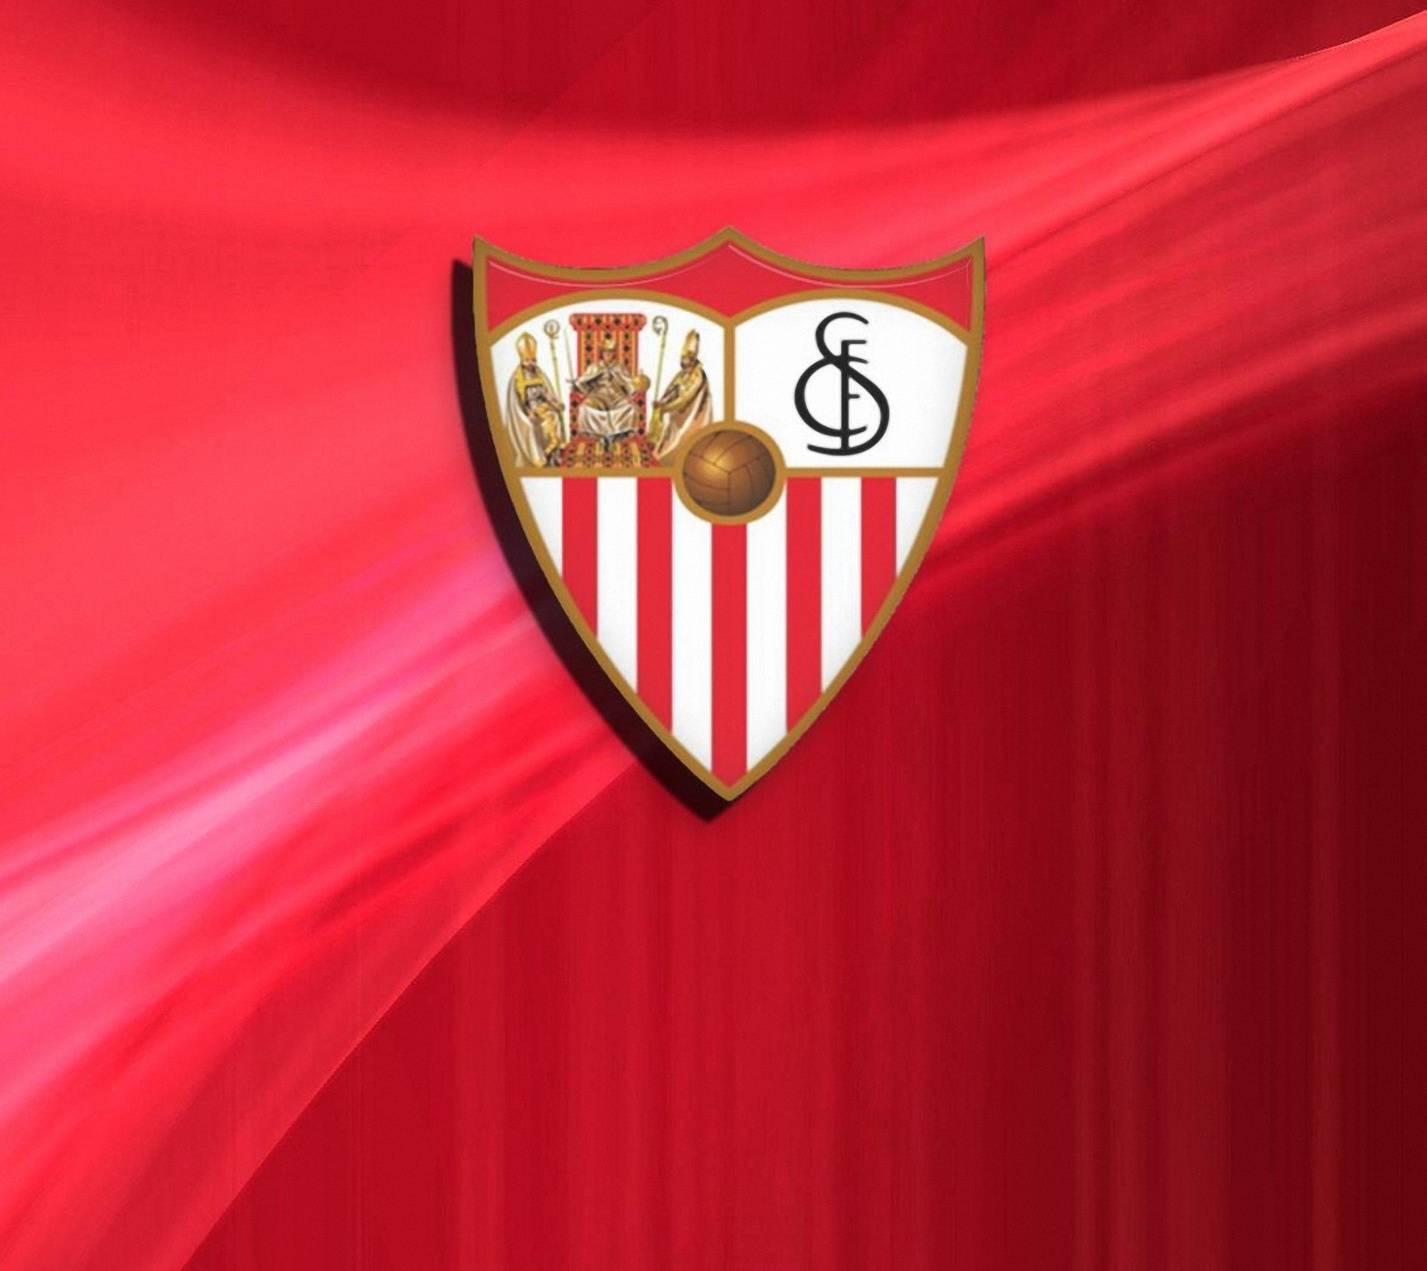 Sevilla Fc wallpaper by sevillon - 8c - Free on ZEDGE™